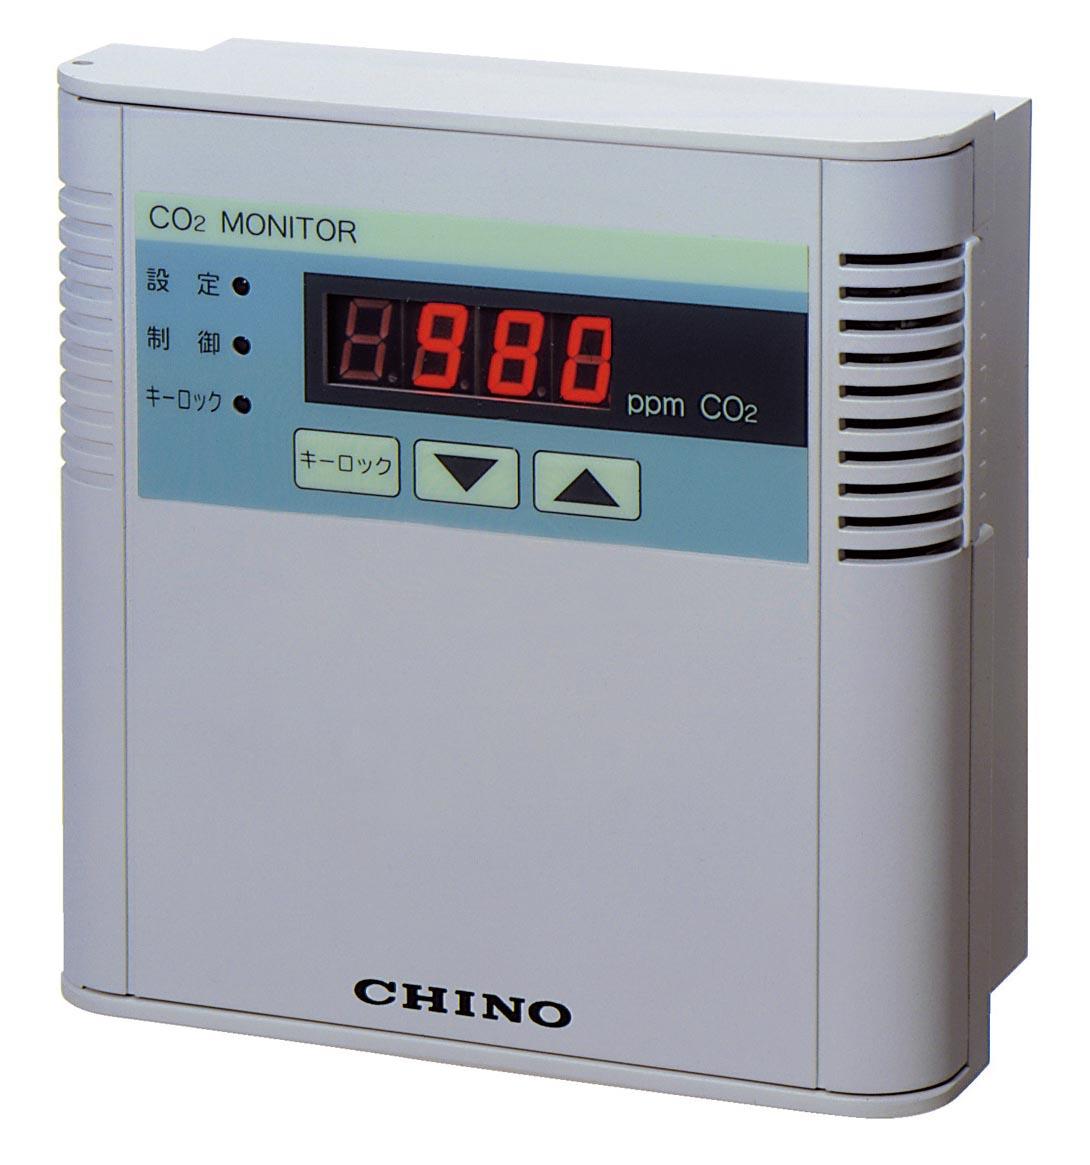 MA1001-00 チノーチノー 壁取付型CO2モニタ MA1001-00, ブリスエレファントカフェテリア:a6defeab --- per-ros.com